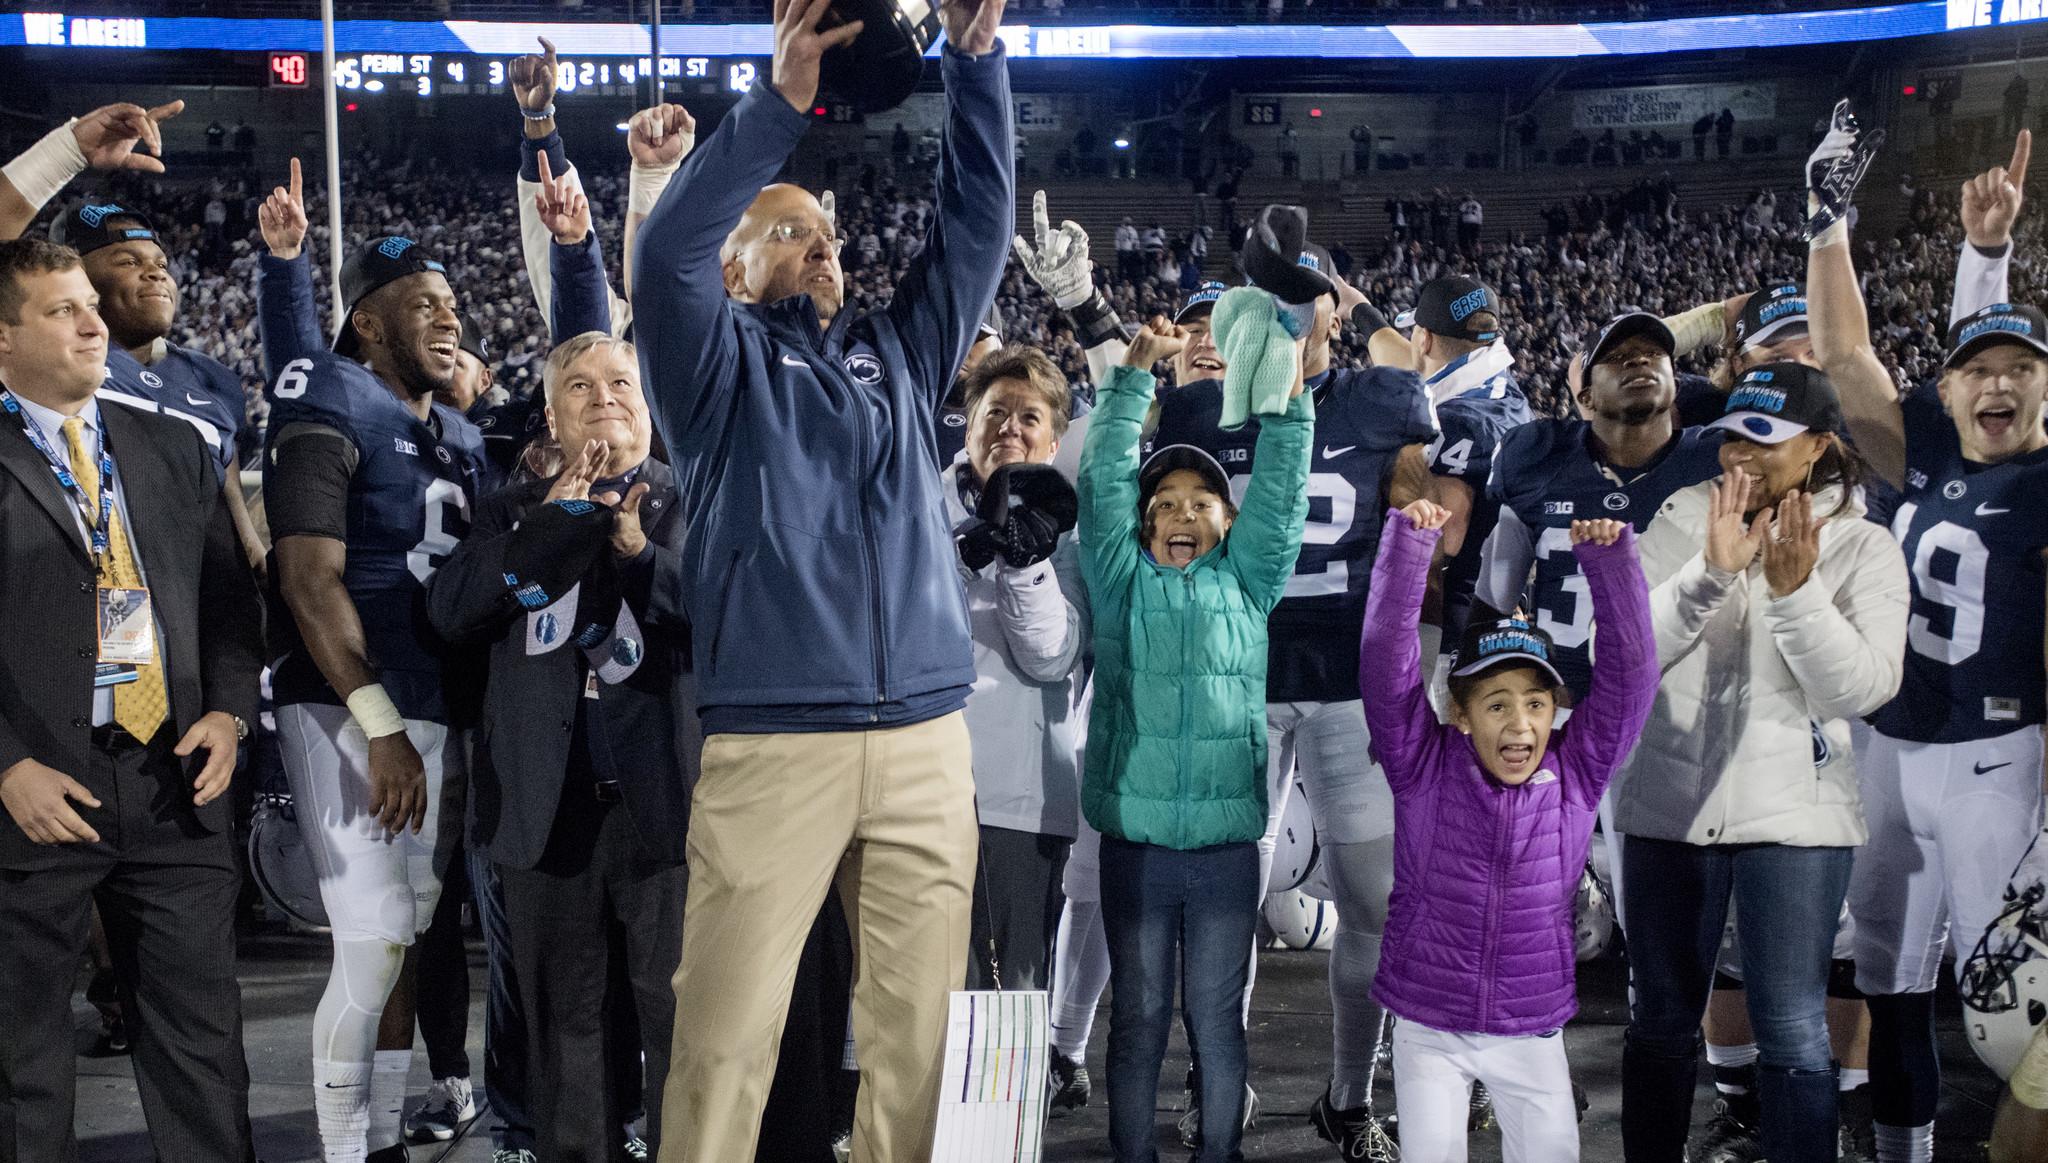 Mc-the-stunning-accomplishments-of-penn-state-s-2016-season-so-far-20161127